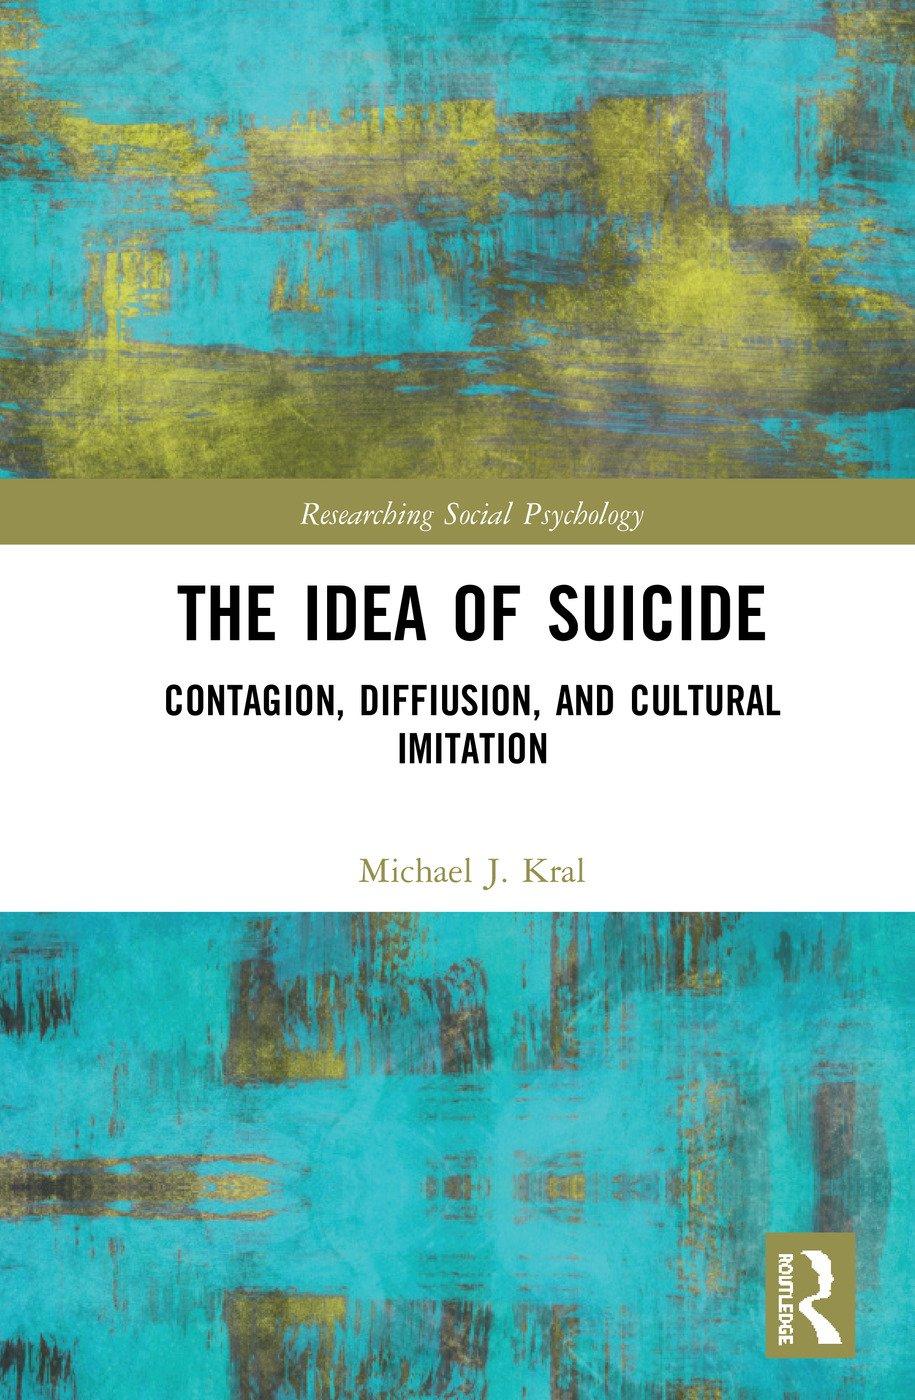 The Idea of Suicide: Contagion, Imitation, and Cultural Diffusion book cover